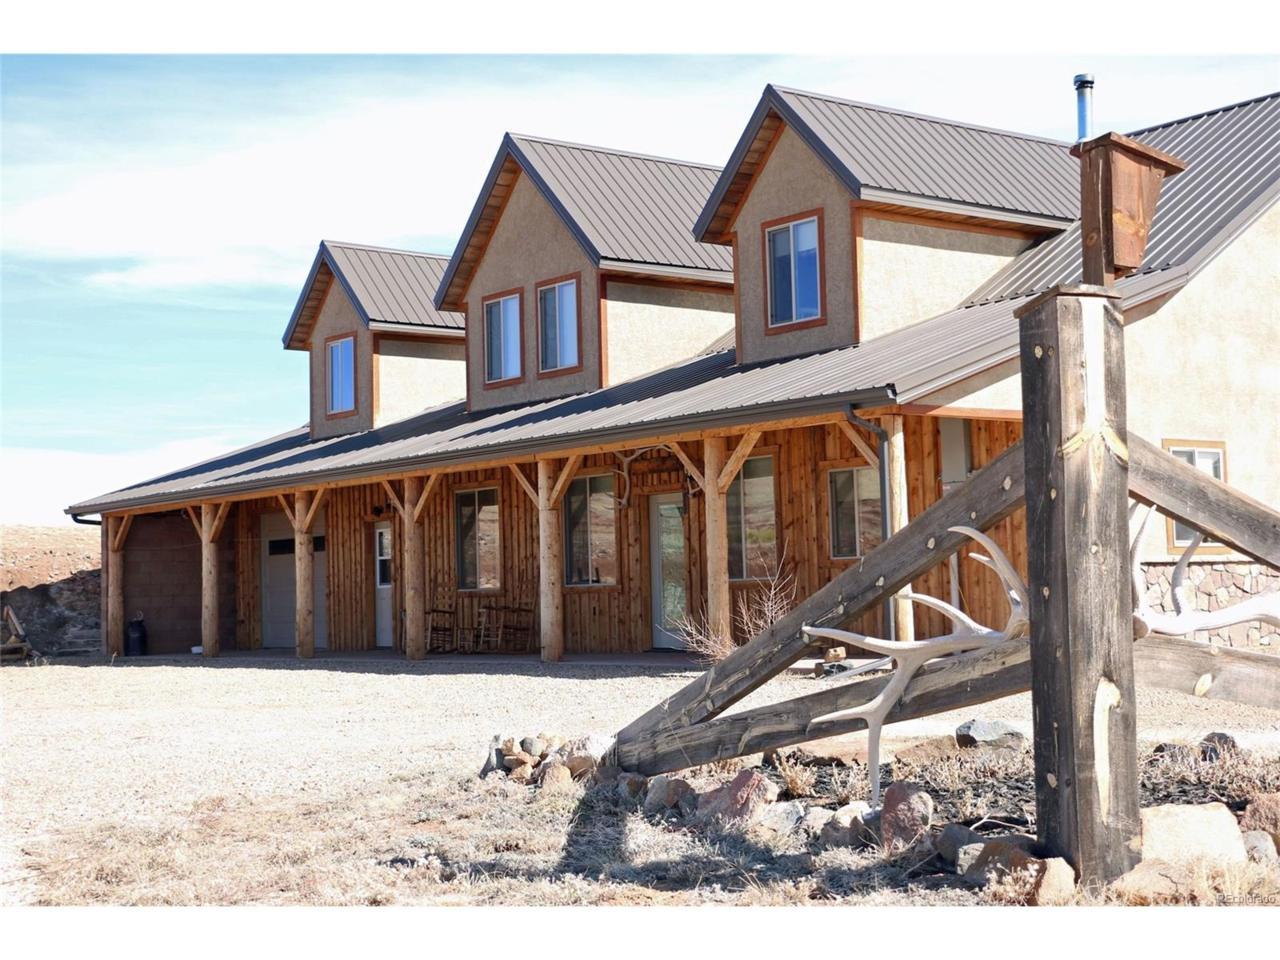 378 Lone Tree Circle, Westcliffe, CO 81252 (MLS #6879846) :: 8z Real Estate